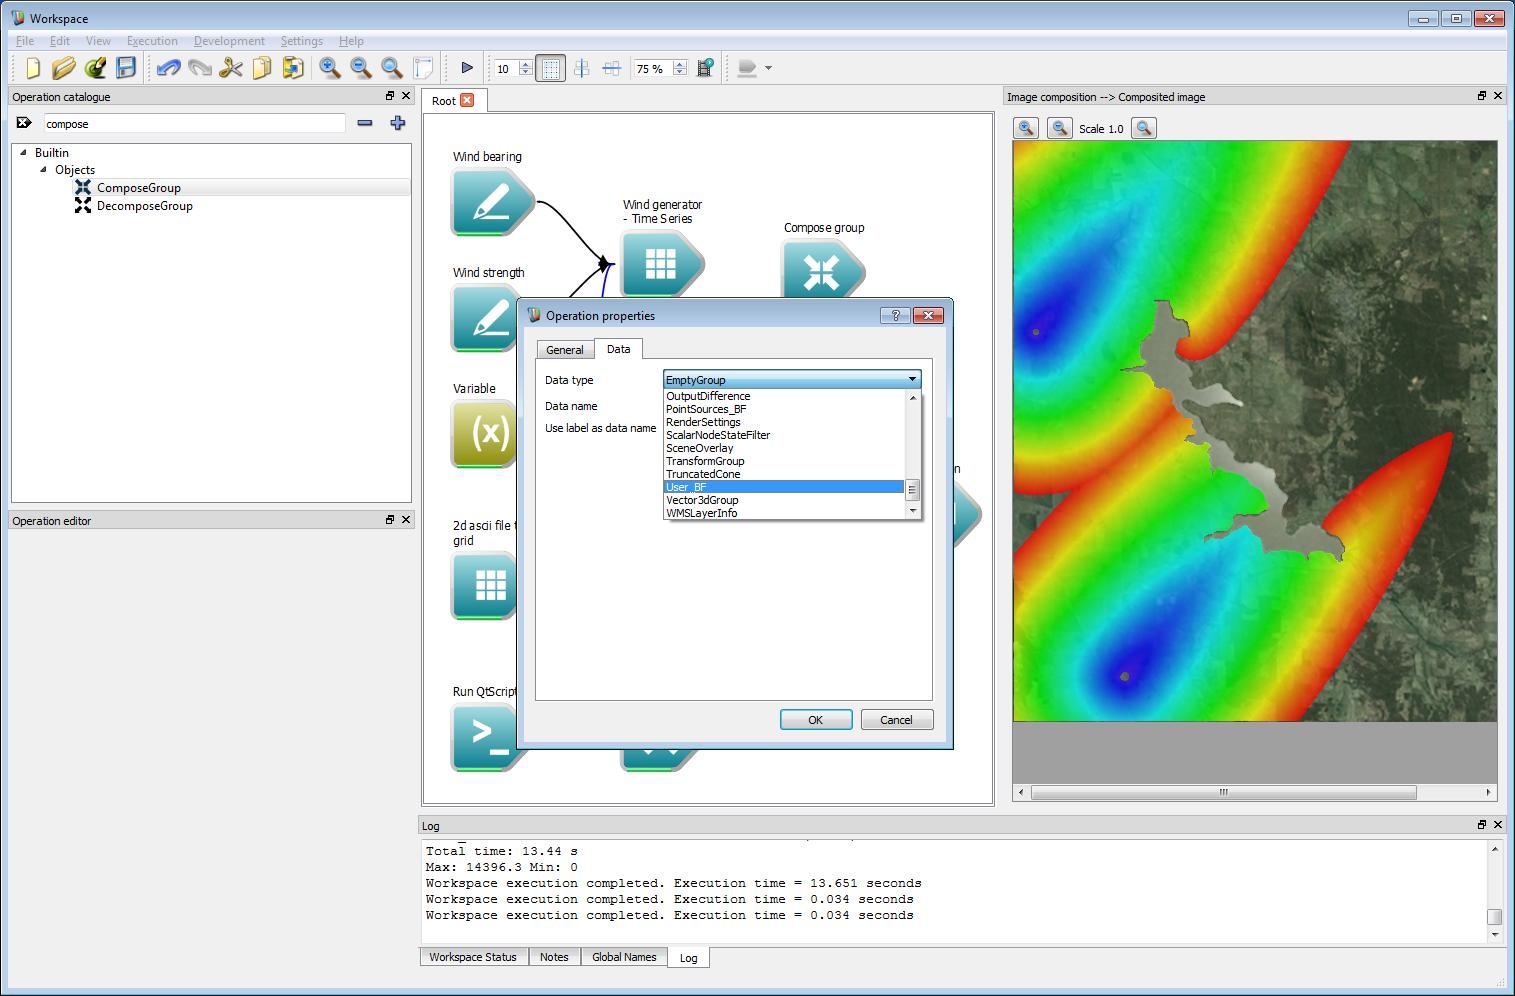 CSol: The Spark bushfire simulator (version 0 9)